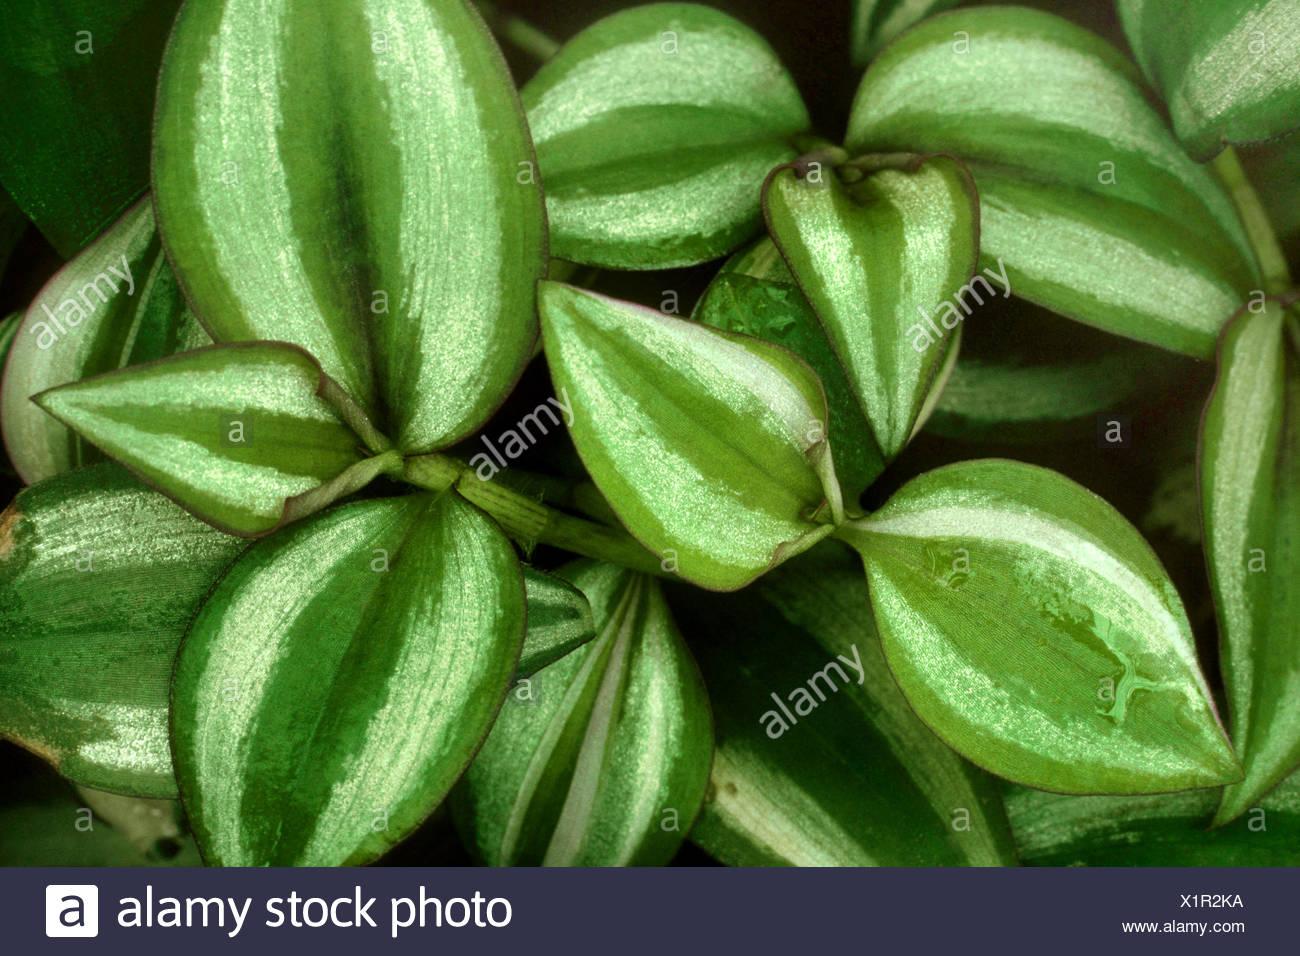 Wandering Jew (Zebrina pendula, Tradescantia zebrina), cultivar Quadricolor - Stock Image